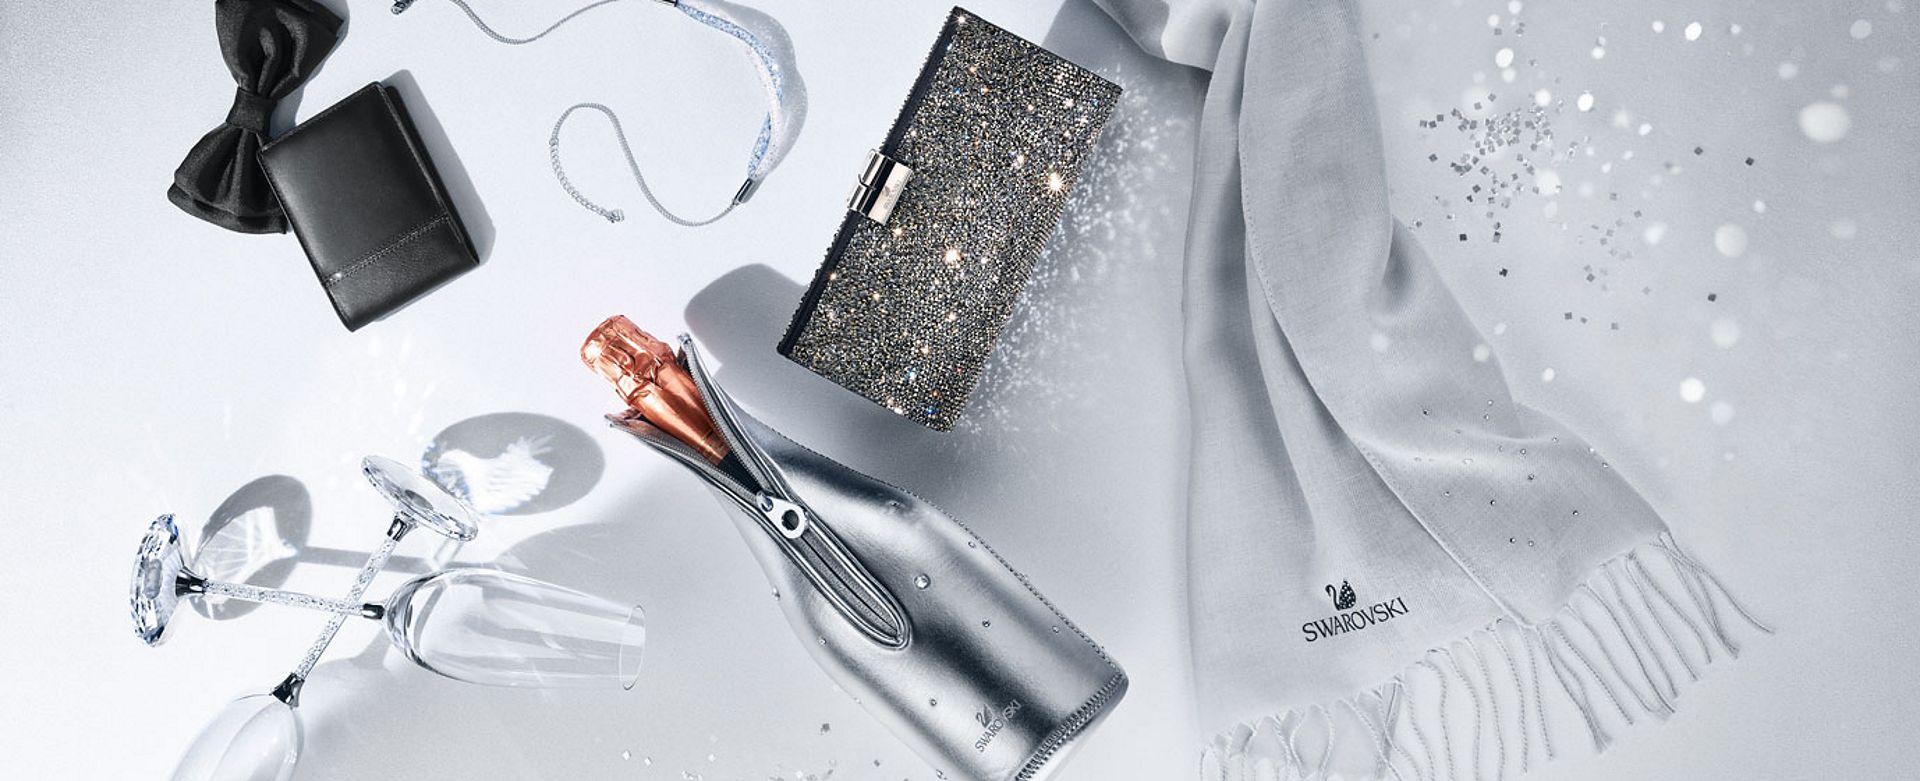 12d61d817e7ce Biżuteryjne trendy | Blask chwili - Swarovski